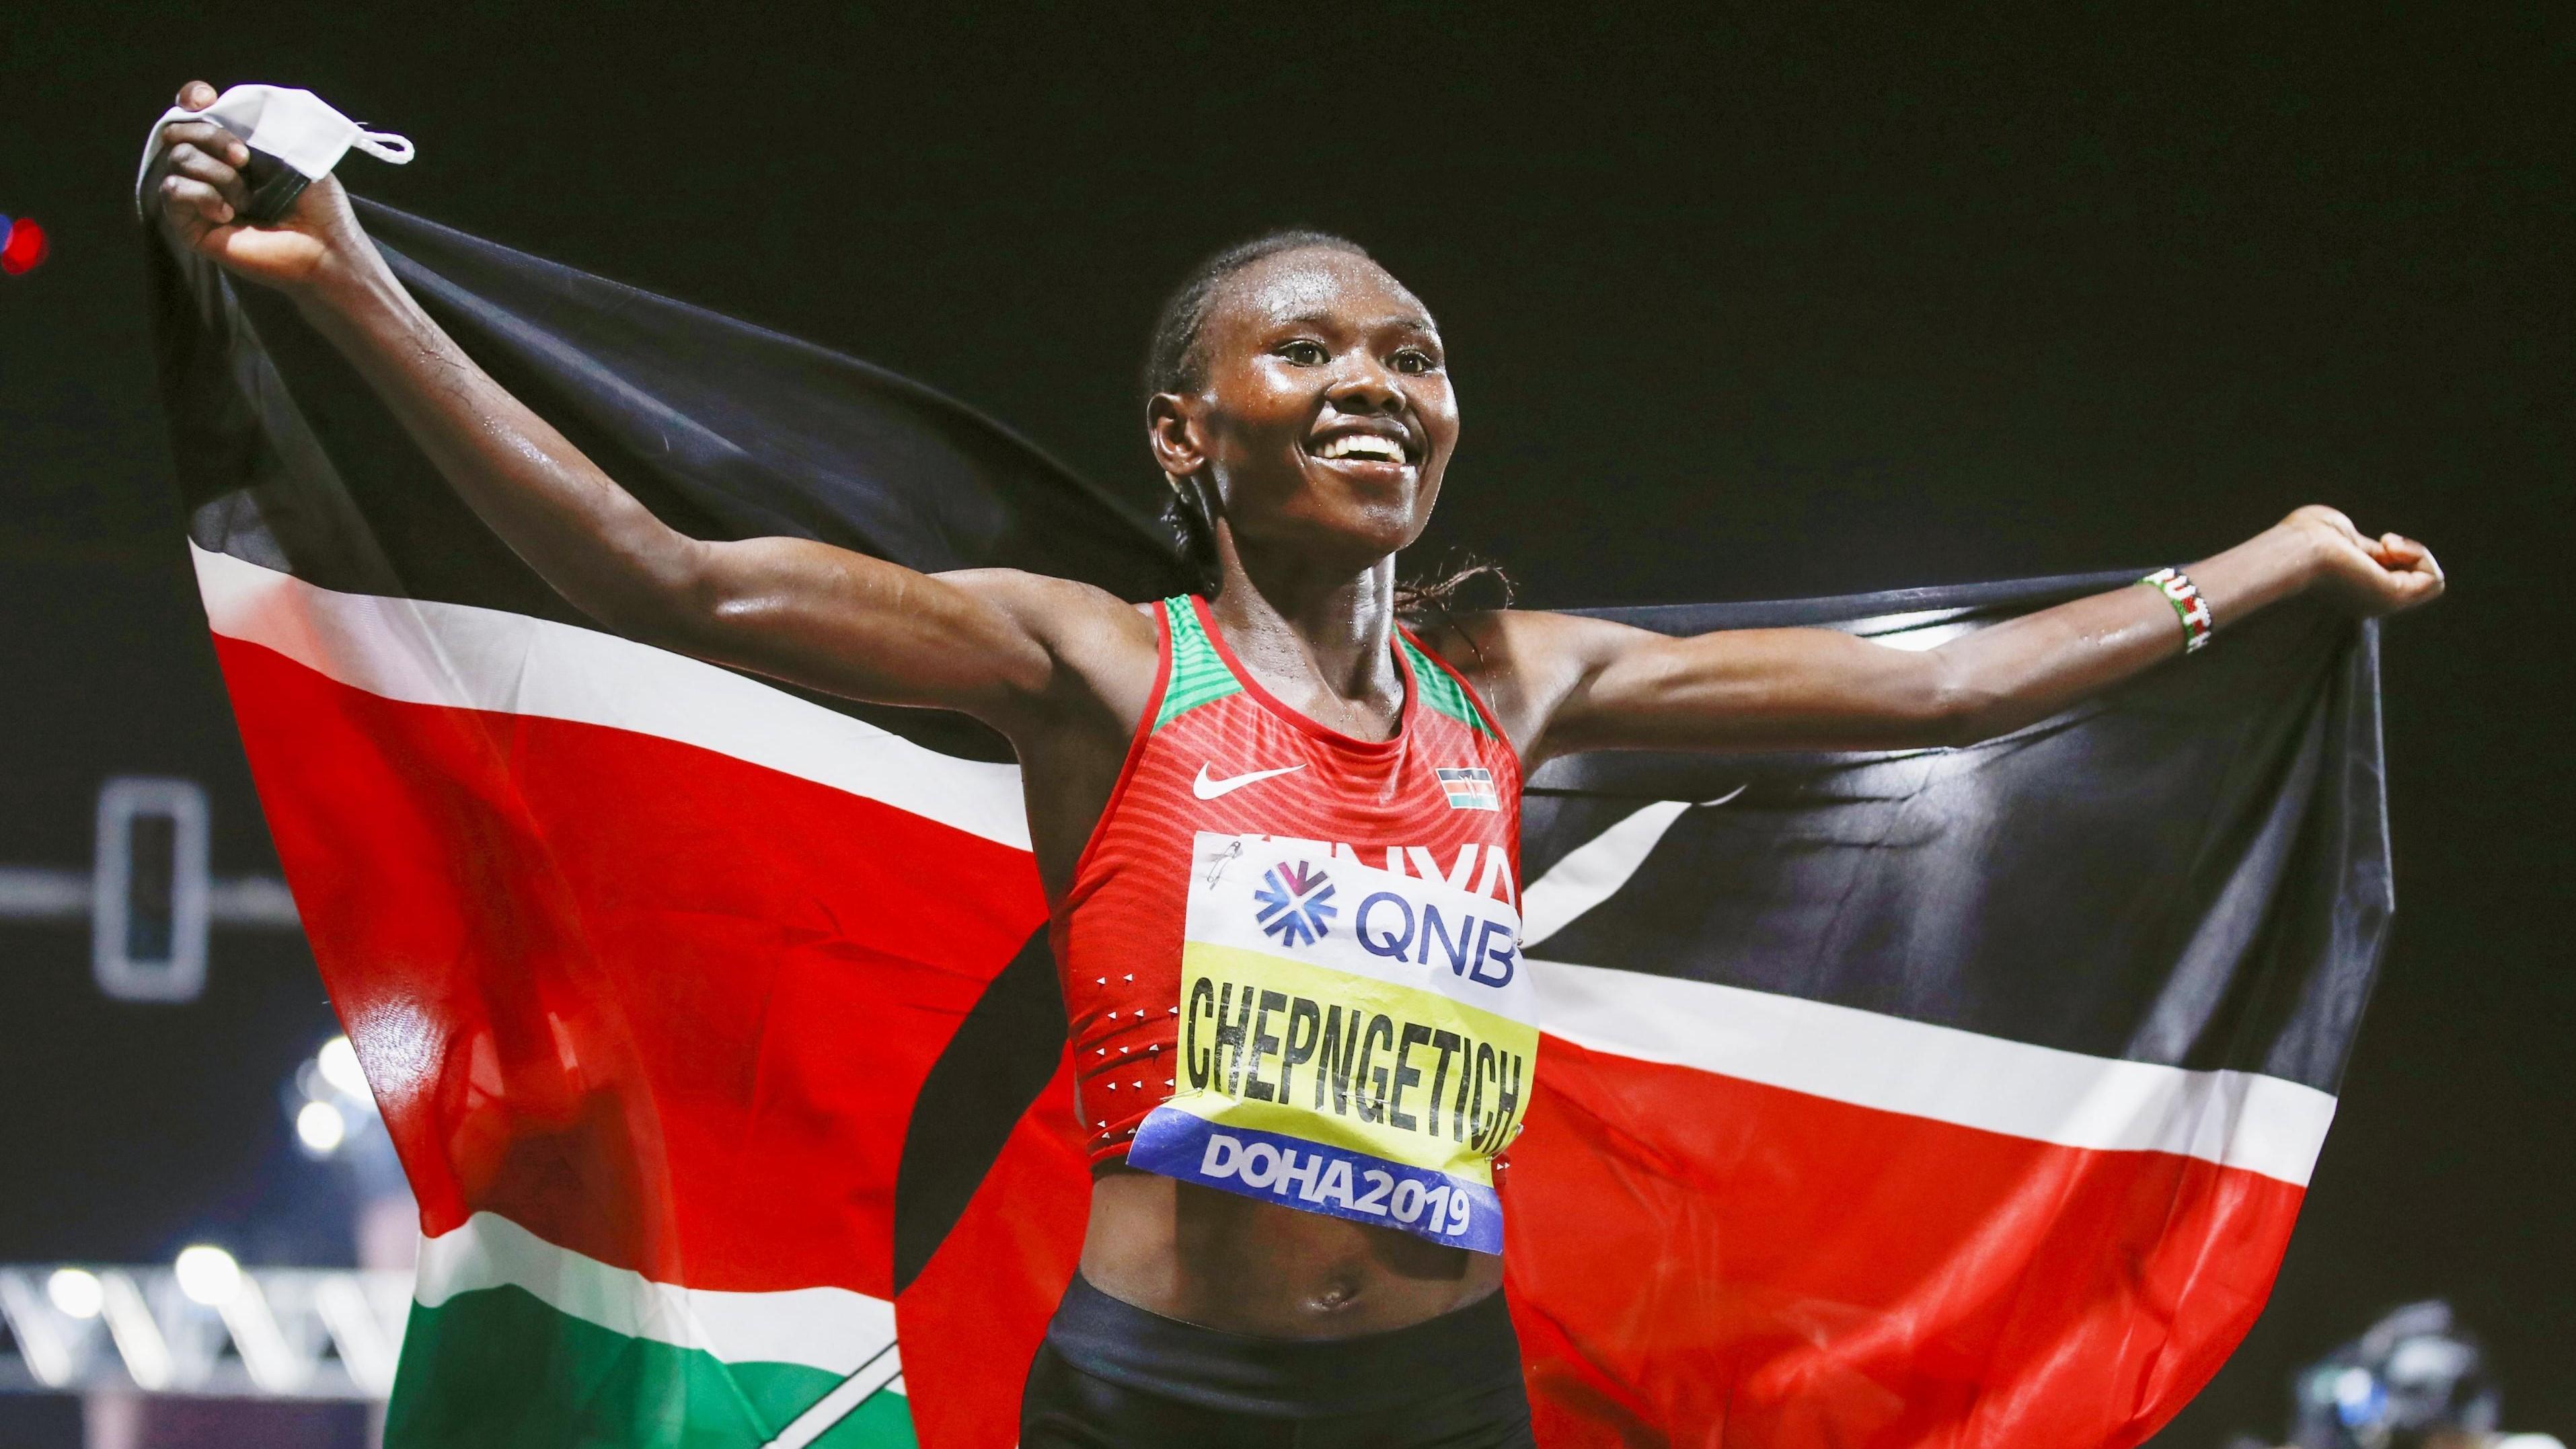 Peres Jepchirchir won gold in women's marathon at Tokyo Olympics